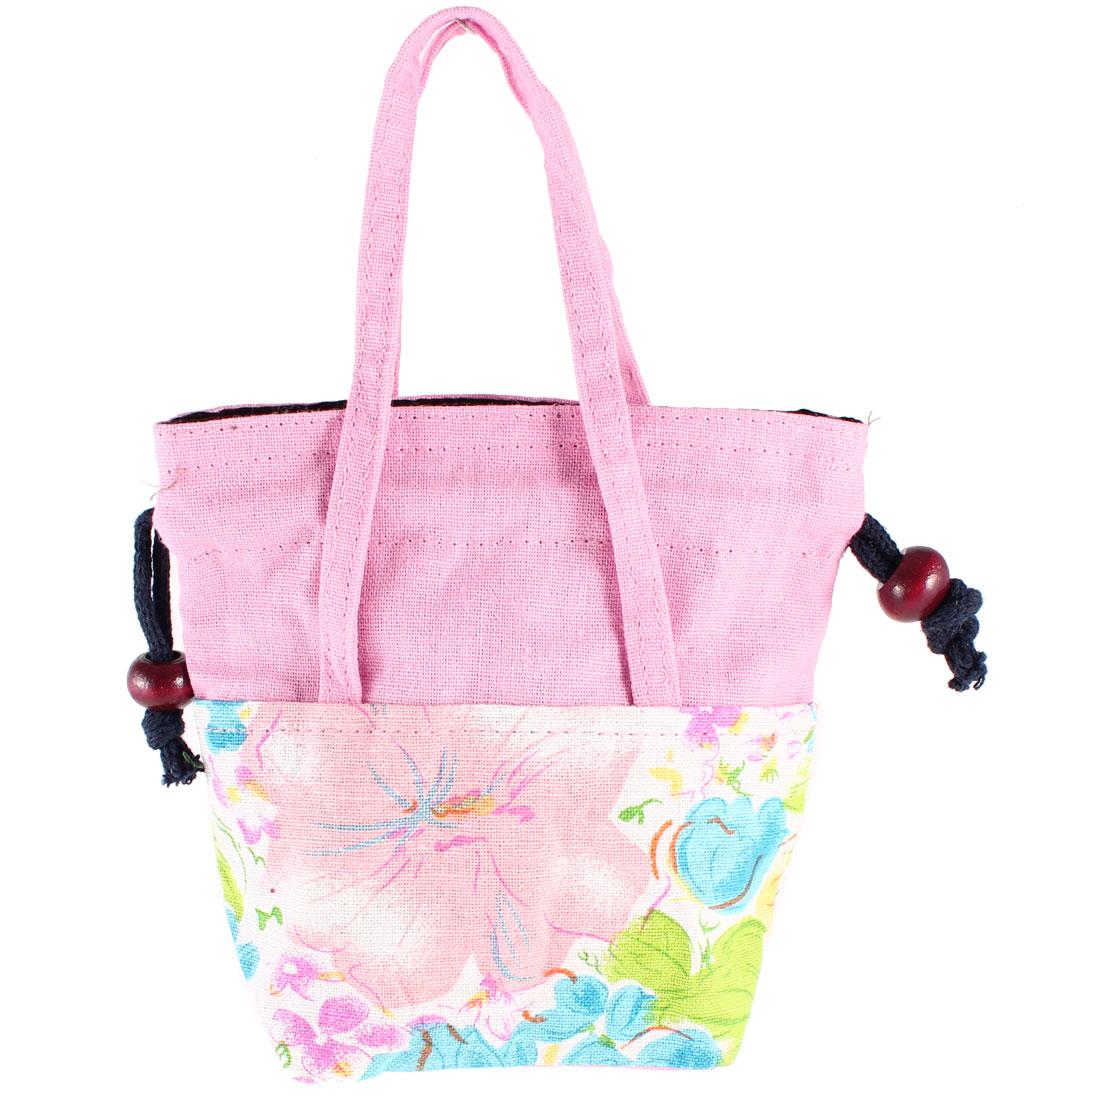 Ladies Floral Pattern Handbag Mobile Phone Holder Purse Pink